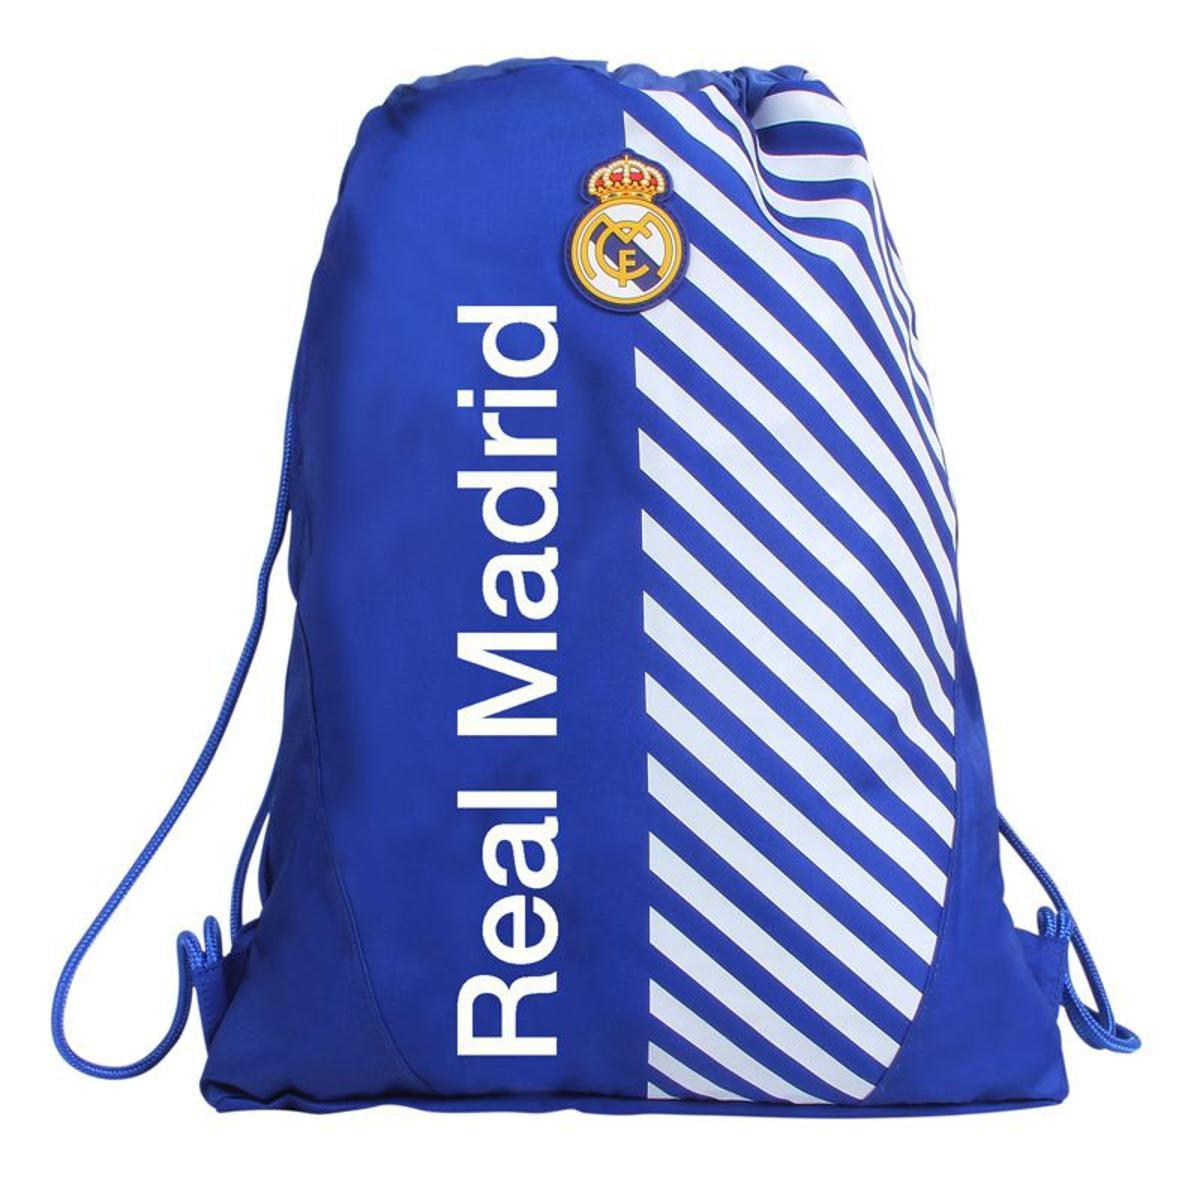 b2b719bb80 Mochila Saco Real Madrid DMW Azul Royal ref. 49210